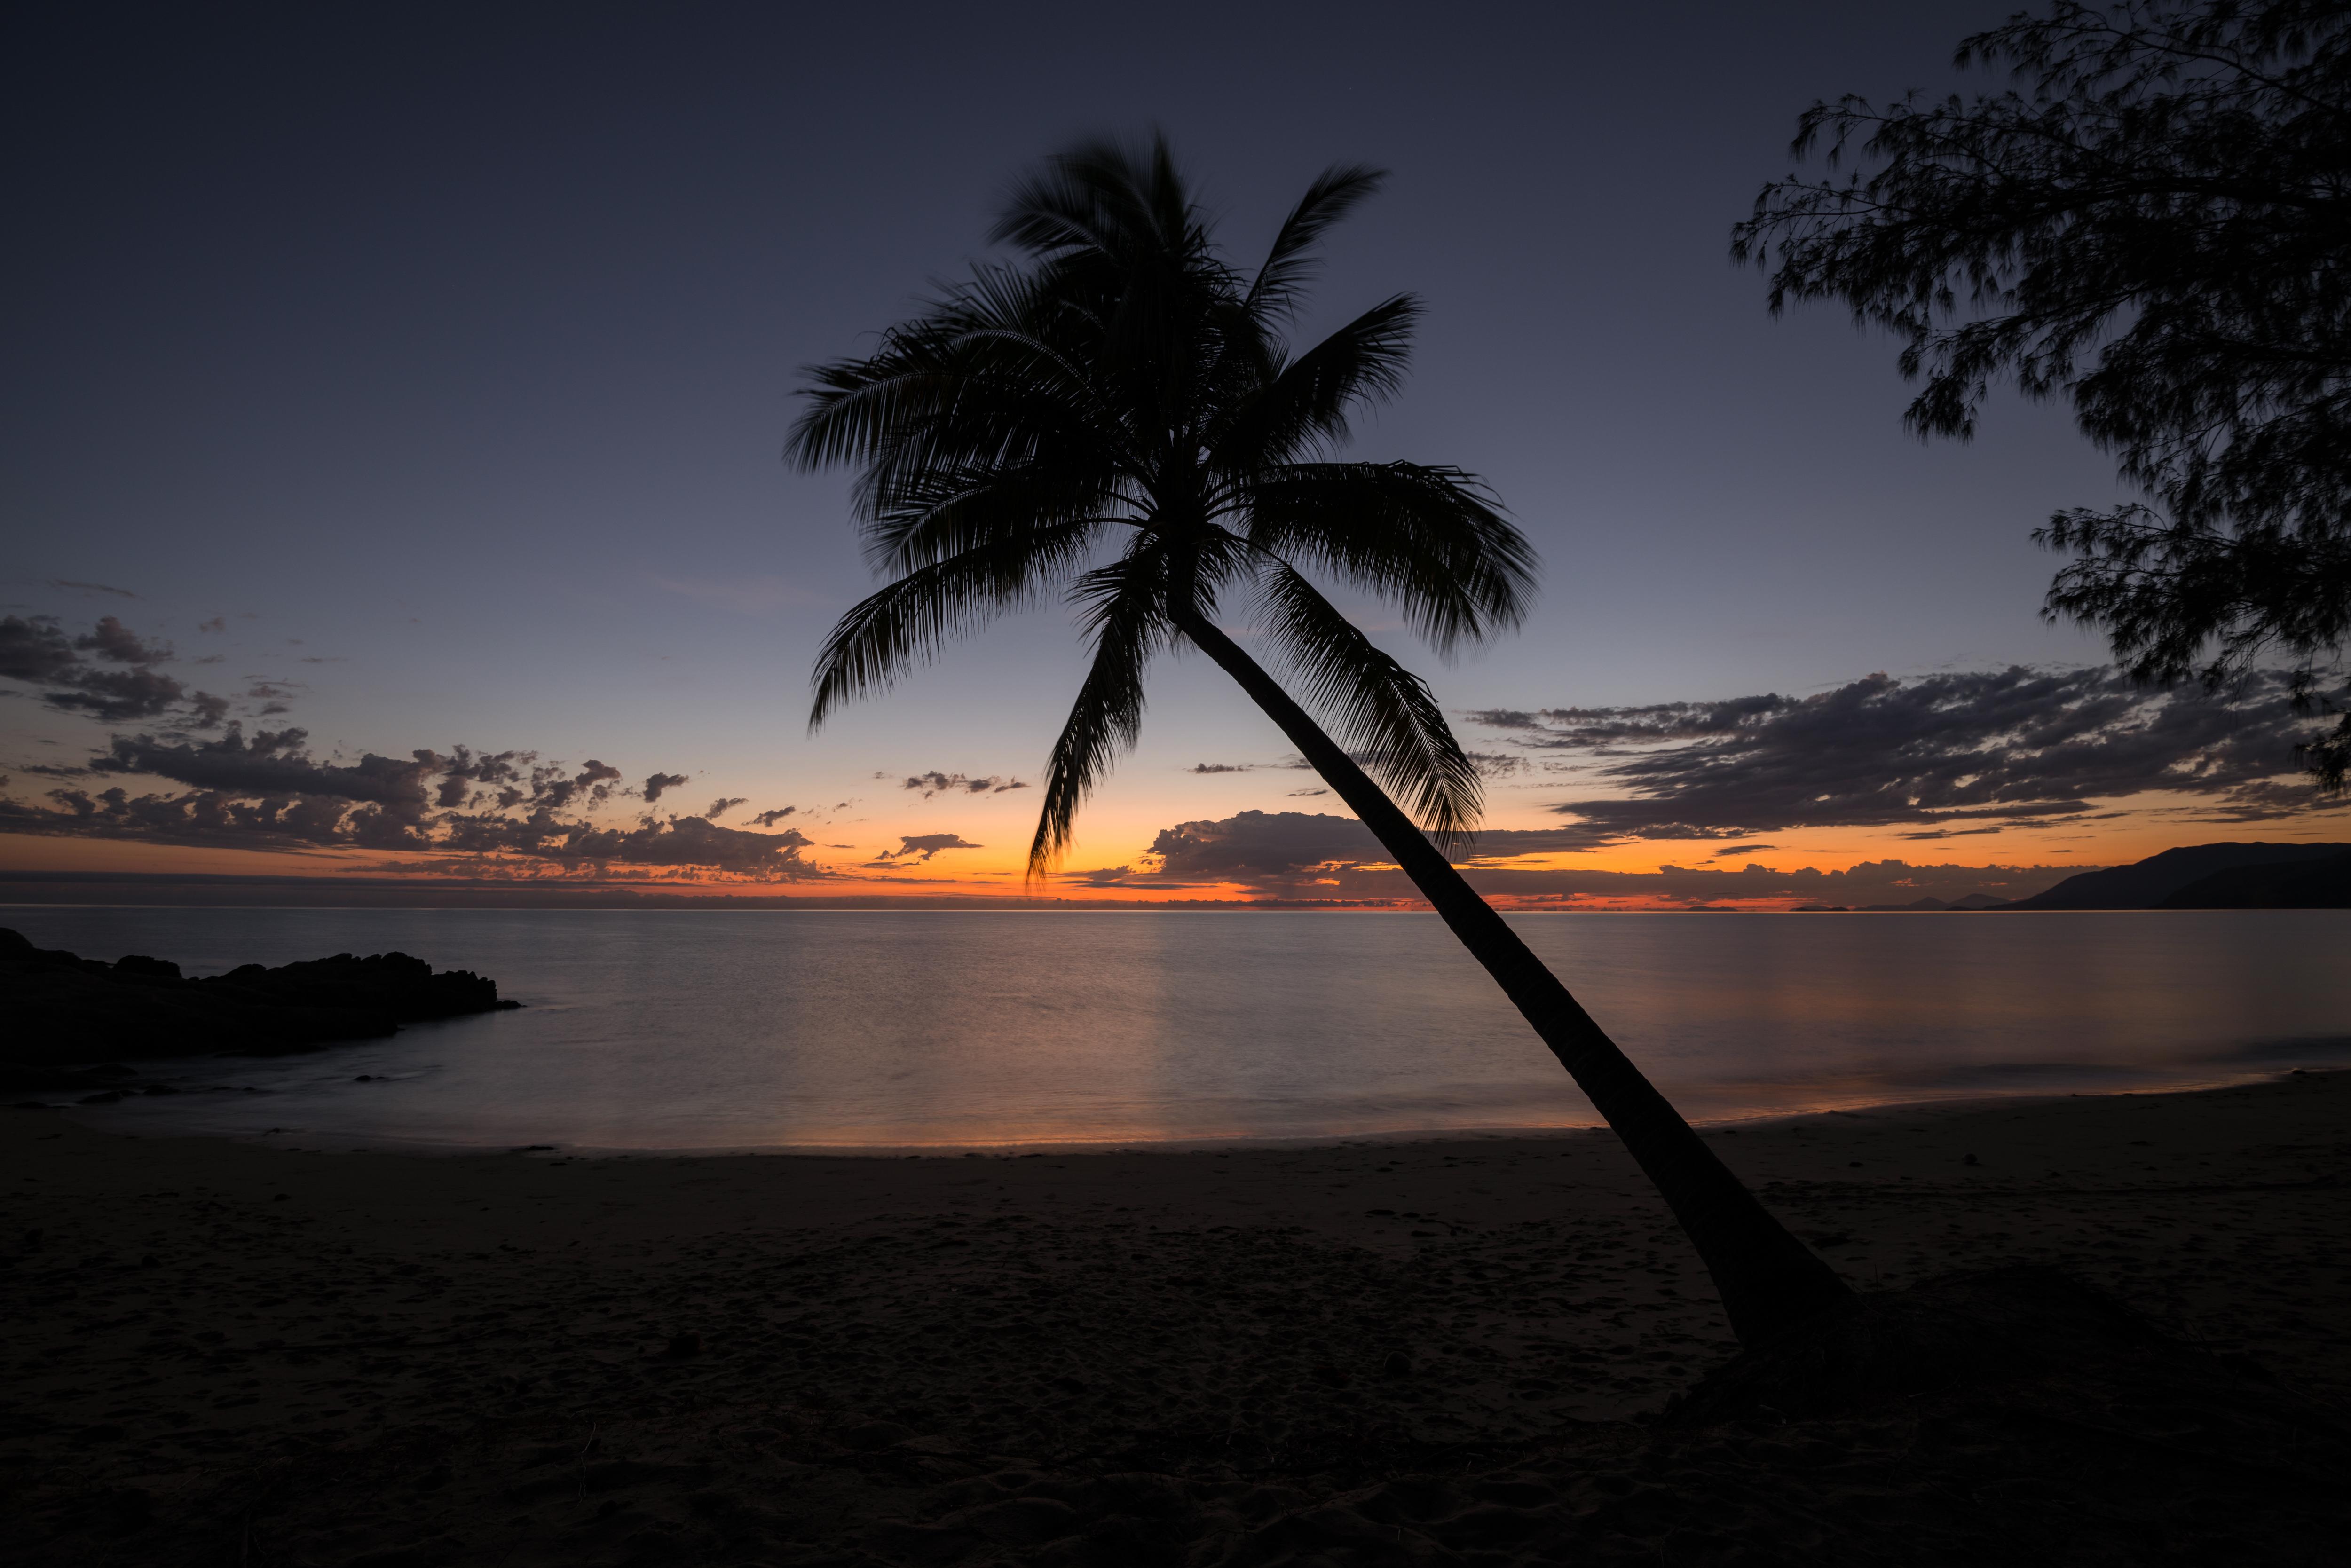 http://www.thalabeach.com.au/wp-content/uploads/2010/07/Thala_Beach_Nature_Reserve_2016__49.jpg